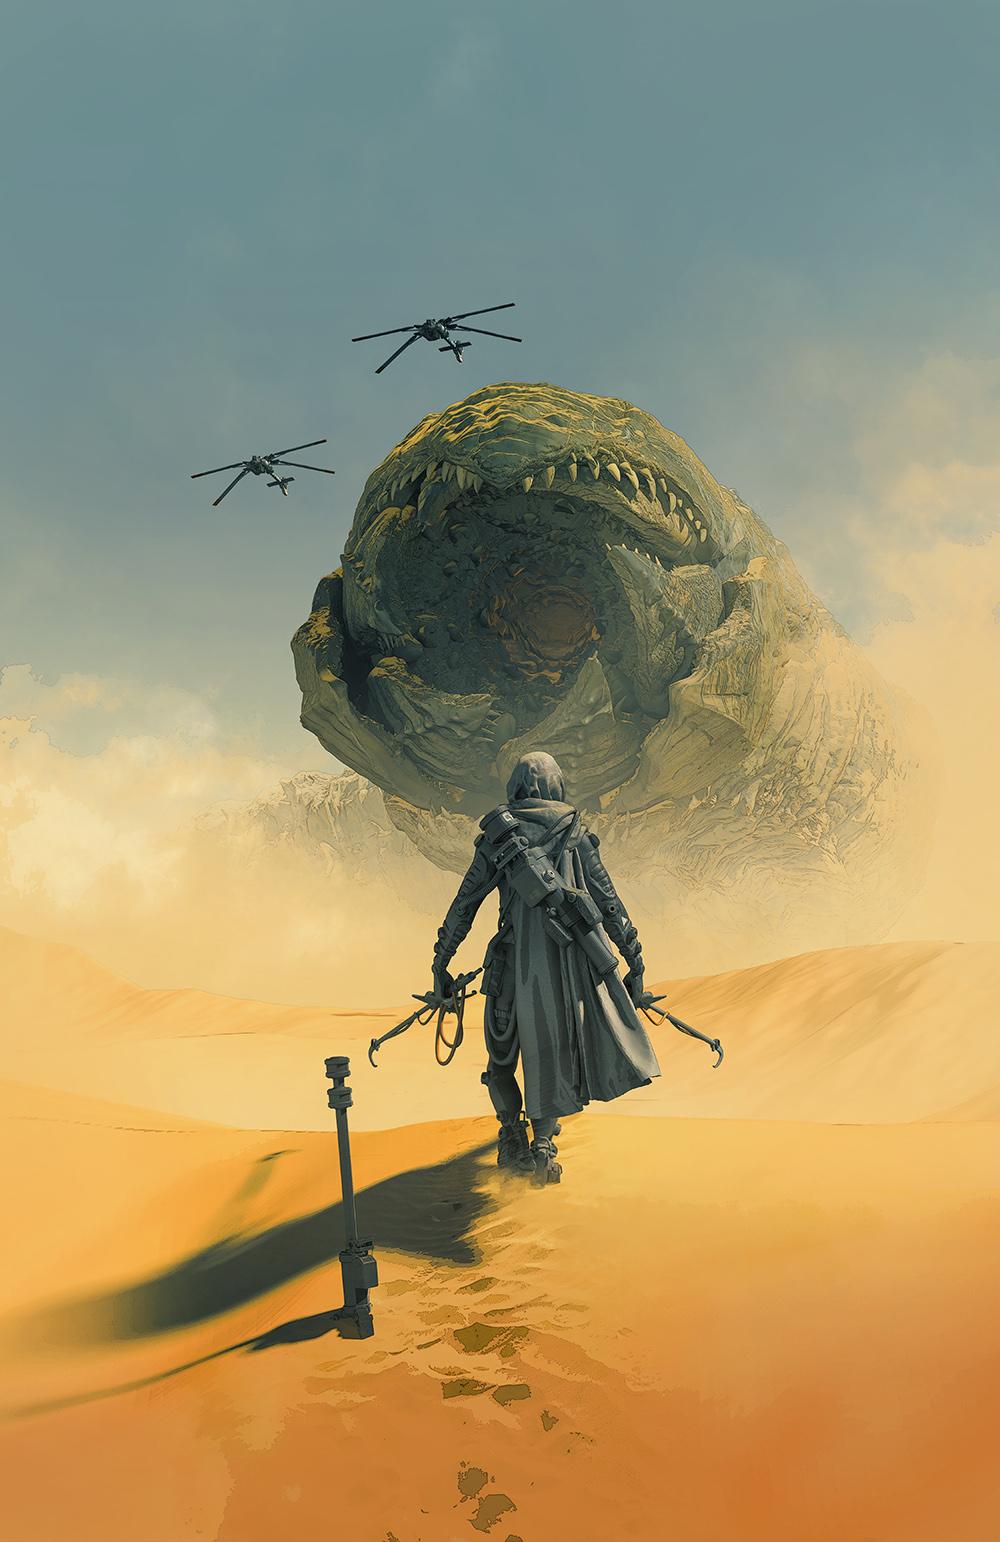 Le film Dune par Denis Villeneuve (Blade Runner 2049) - Page 2 Dune10